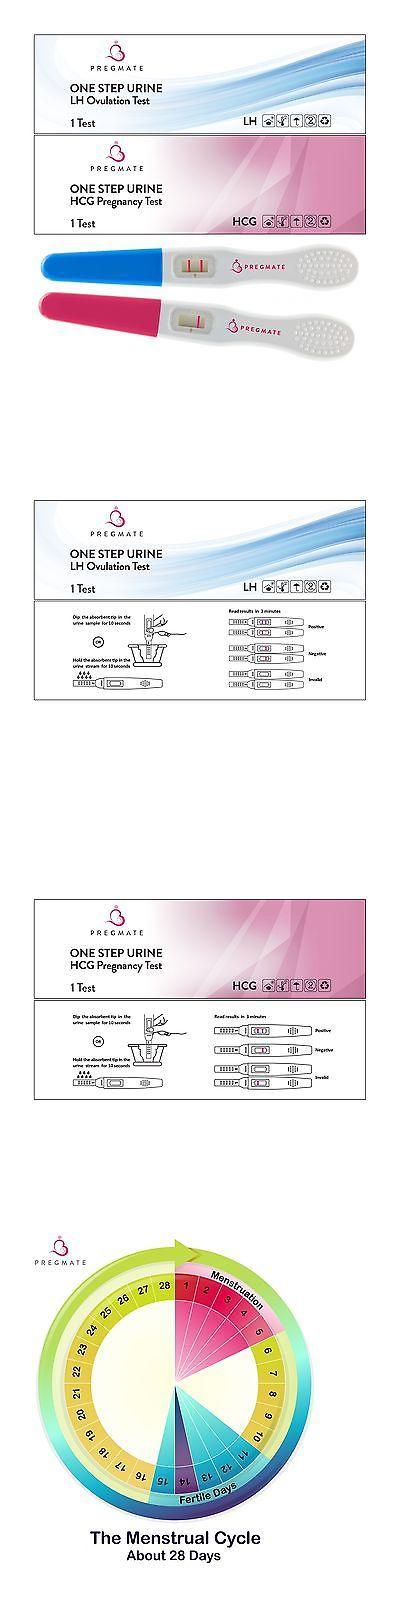 Fertility Monitors and OPKs: Pregmate 20 Ovulation (Lh) Plus 5 Pregnancy (Hcg) Midstream Tests Sticks Stri... -> BUY IT NOW ONLY: $33.89 on eBay!